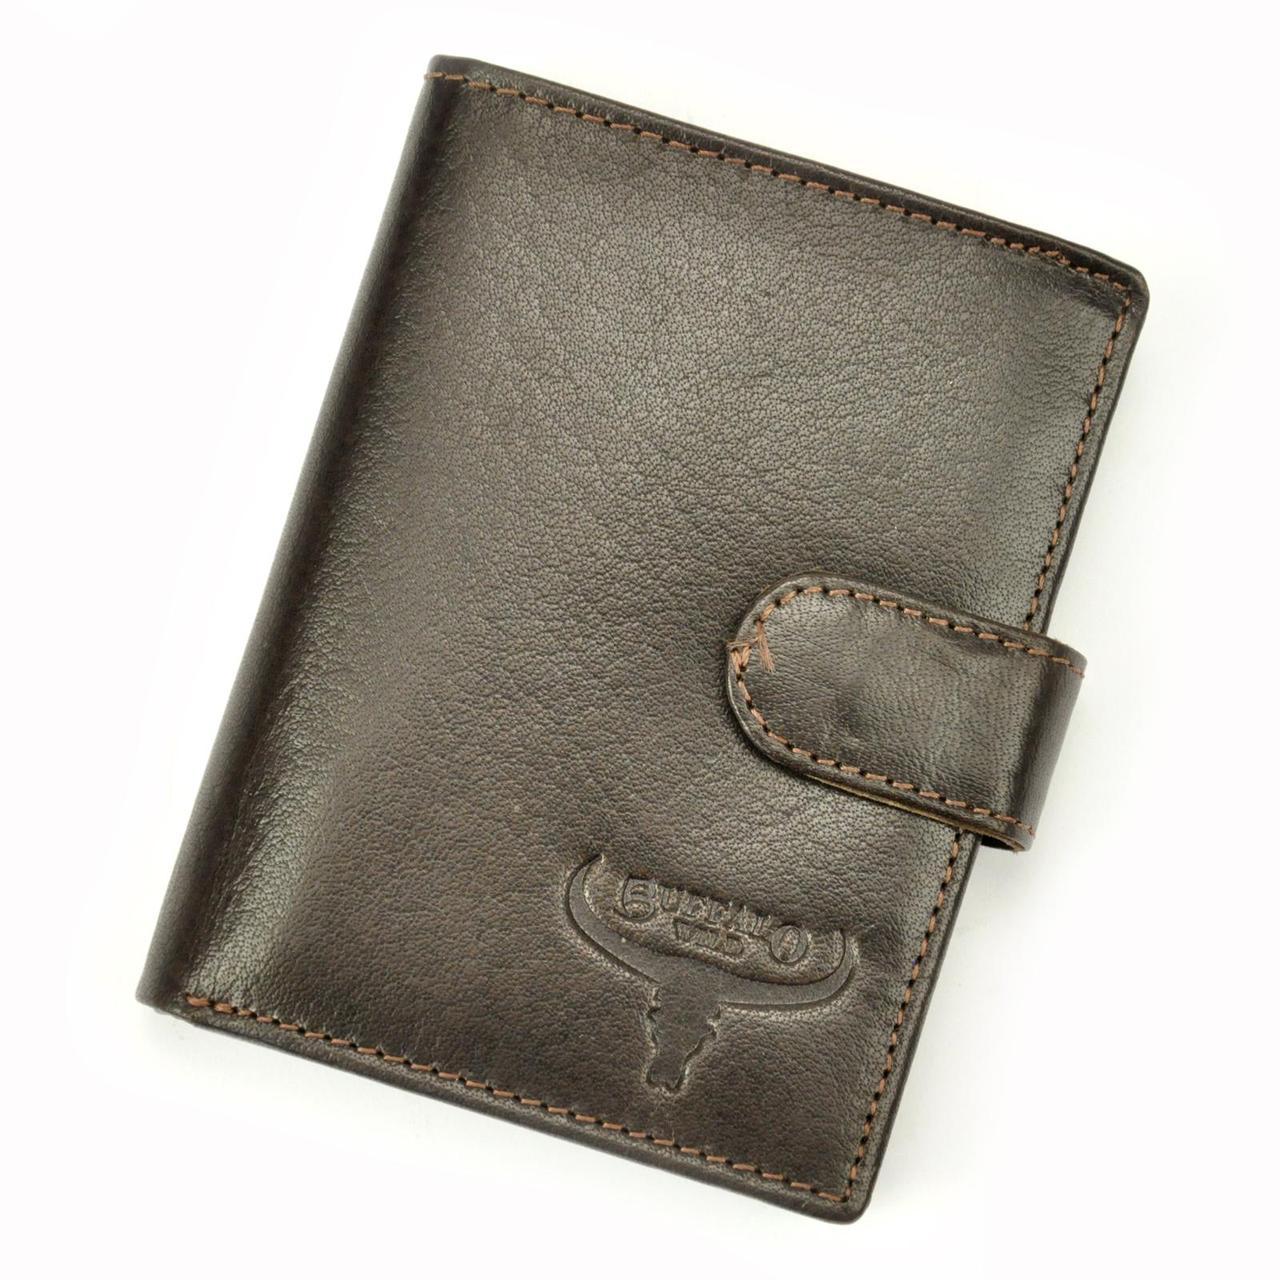 Мужской кожаный кошелек Wild BUFFALO N4L-BWJ RFID Коньяк